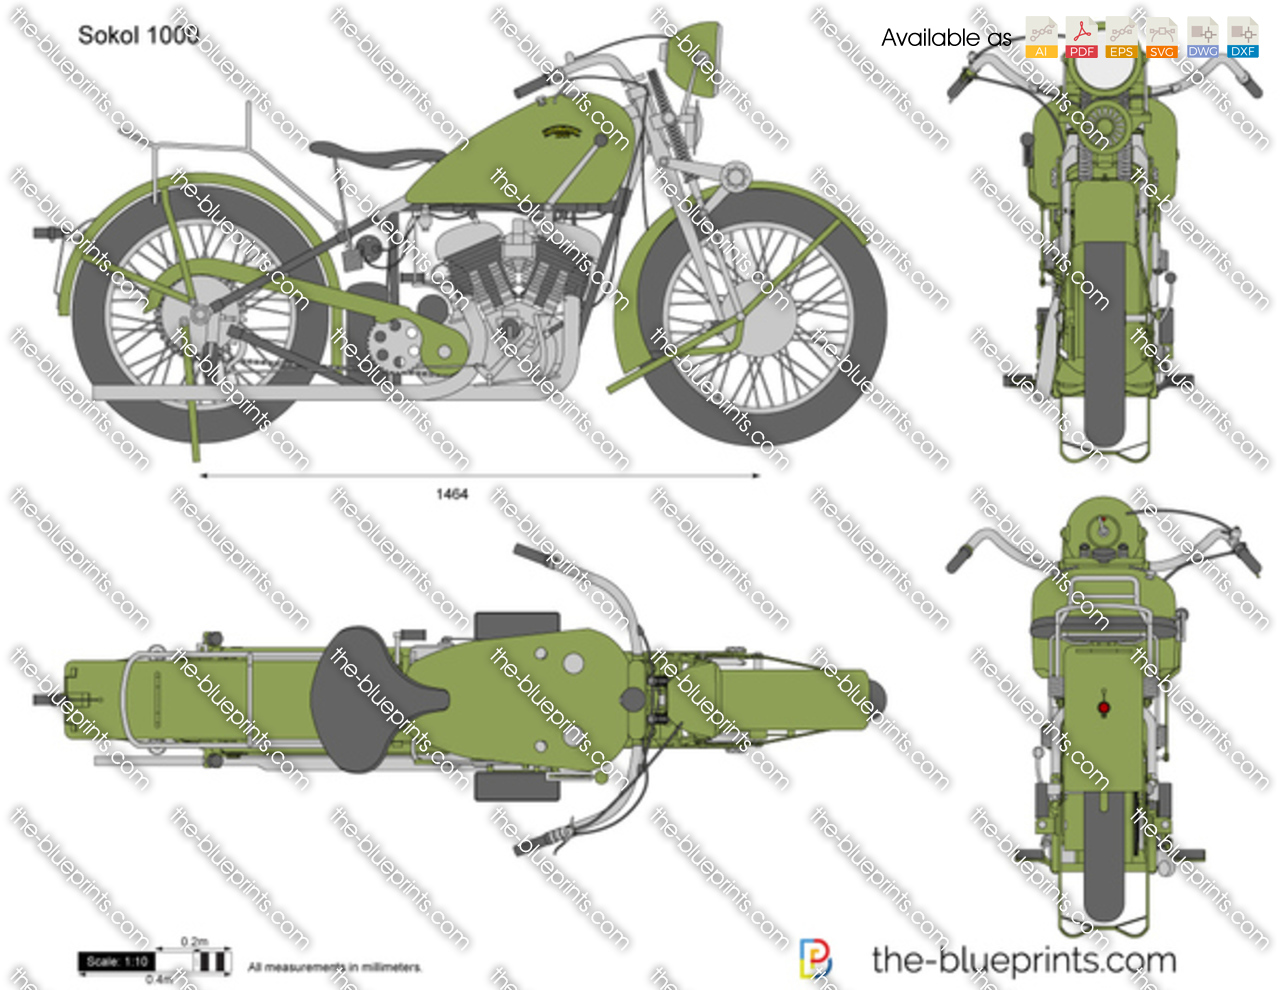 Sokol 1000 1934